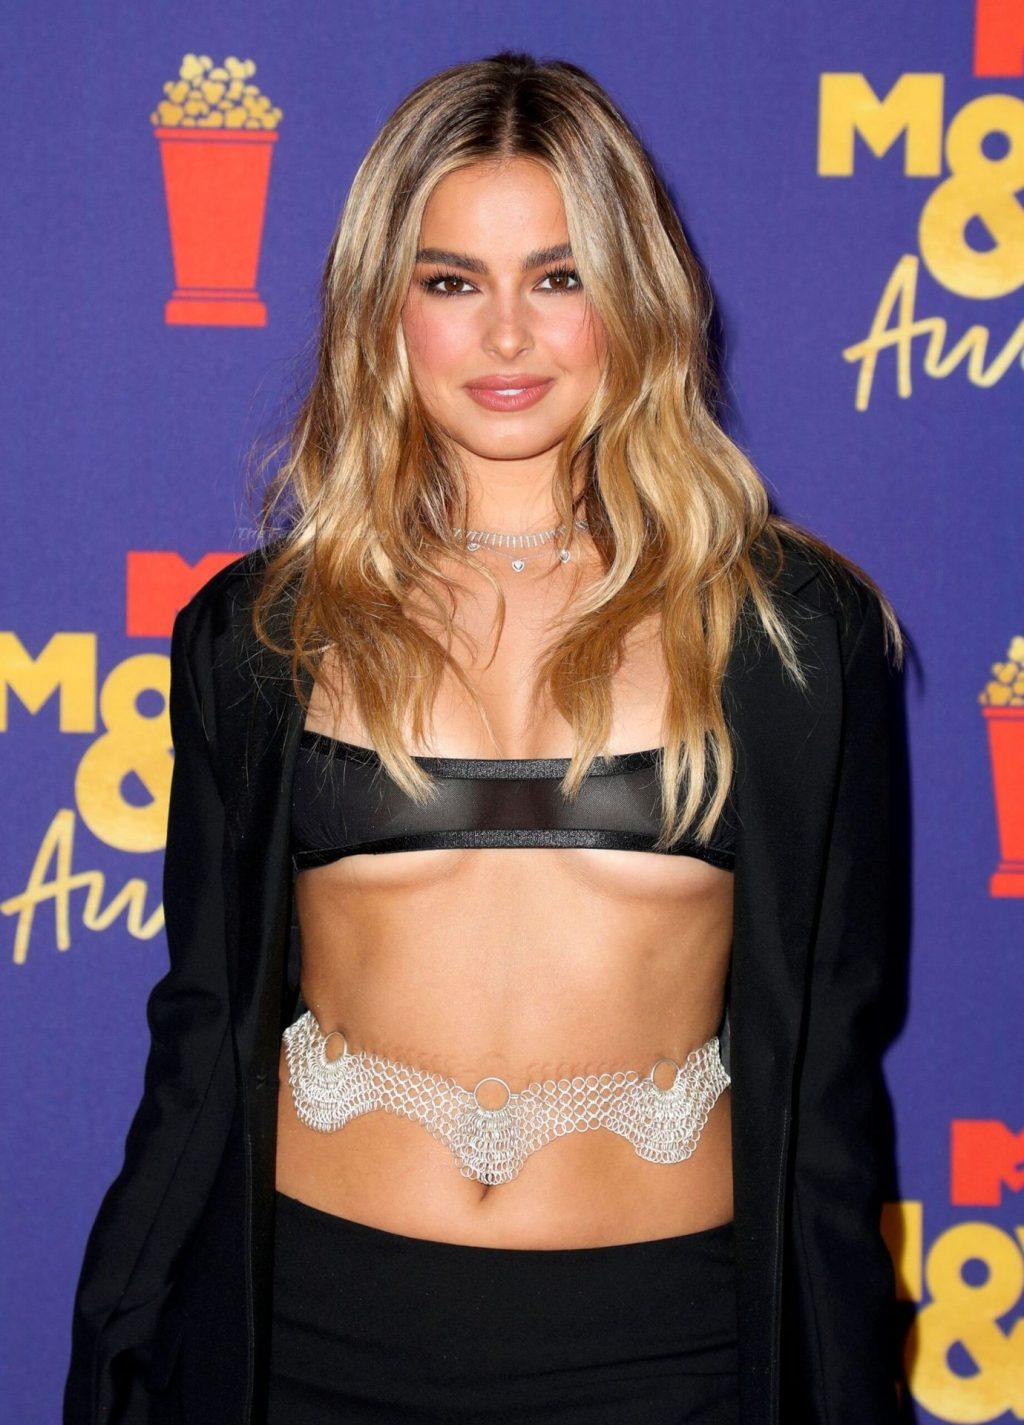 Addison Rae Flaunts Her Tits at the 2021 MTV Movie & TV Awards (44 Photos)